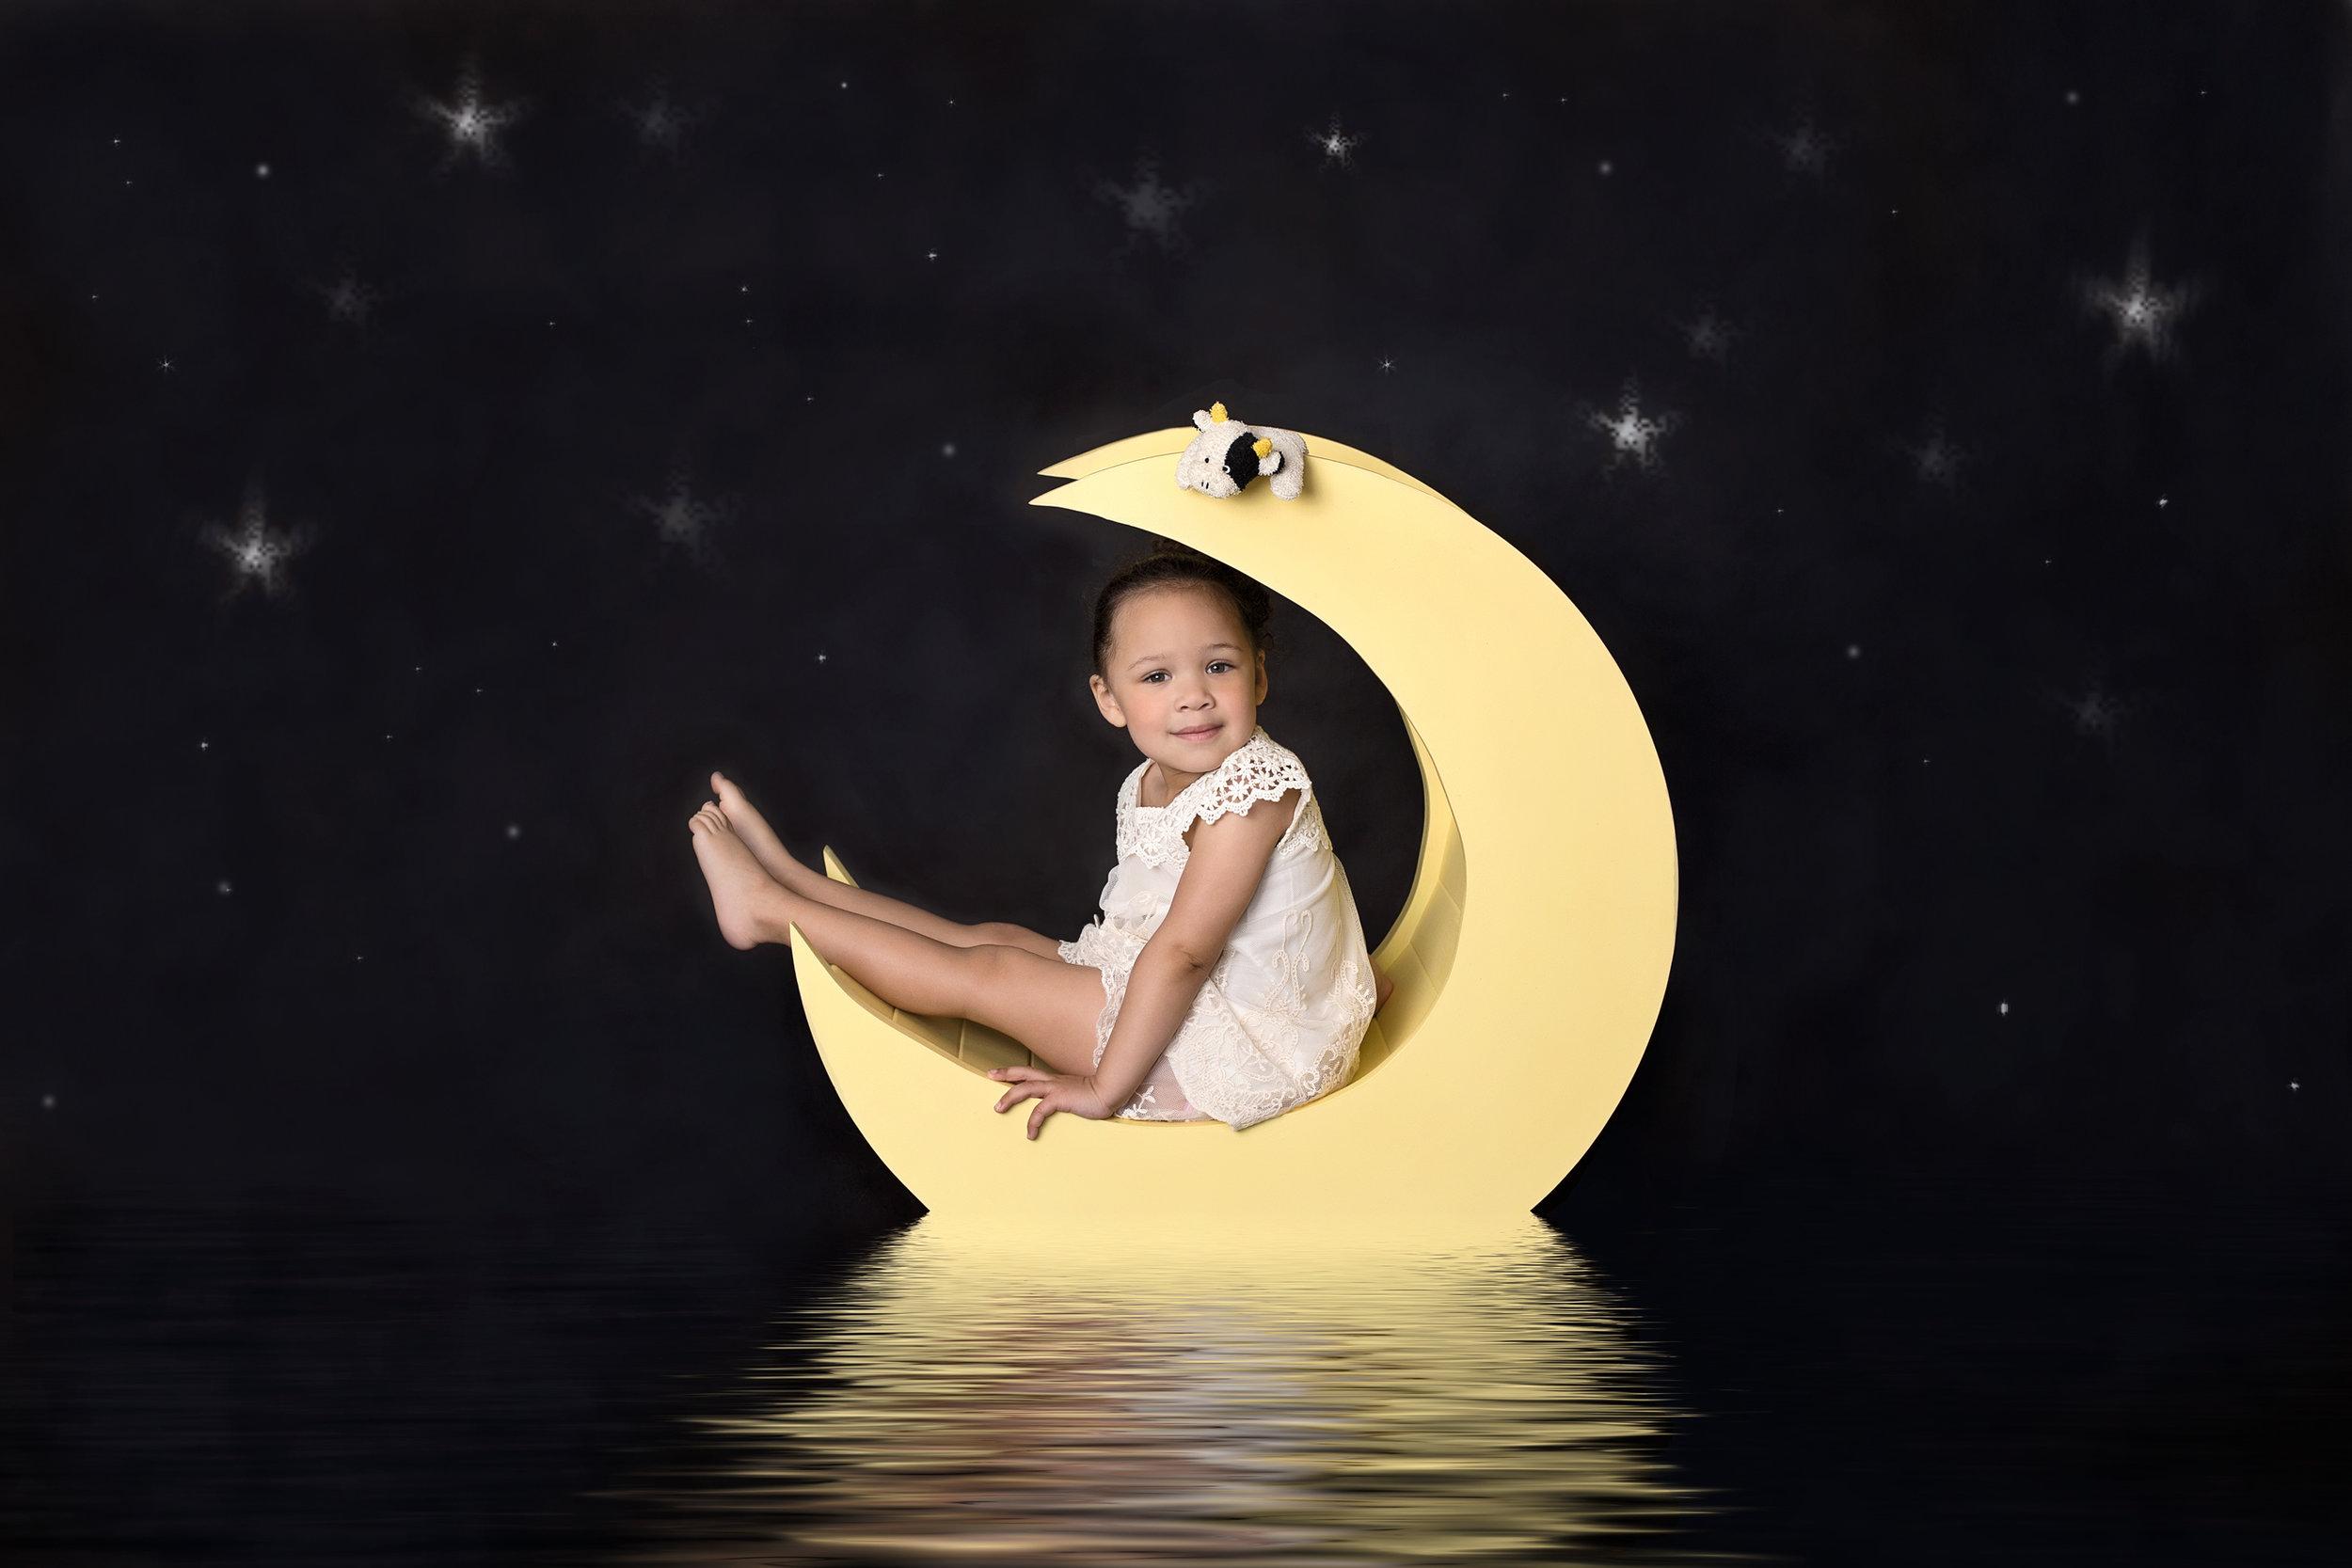 rozy moon.jpg